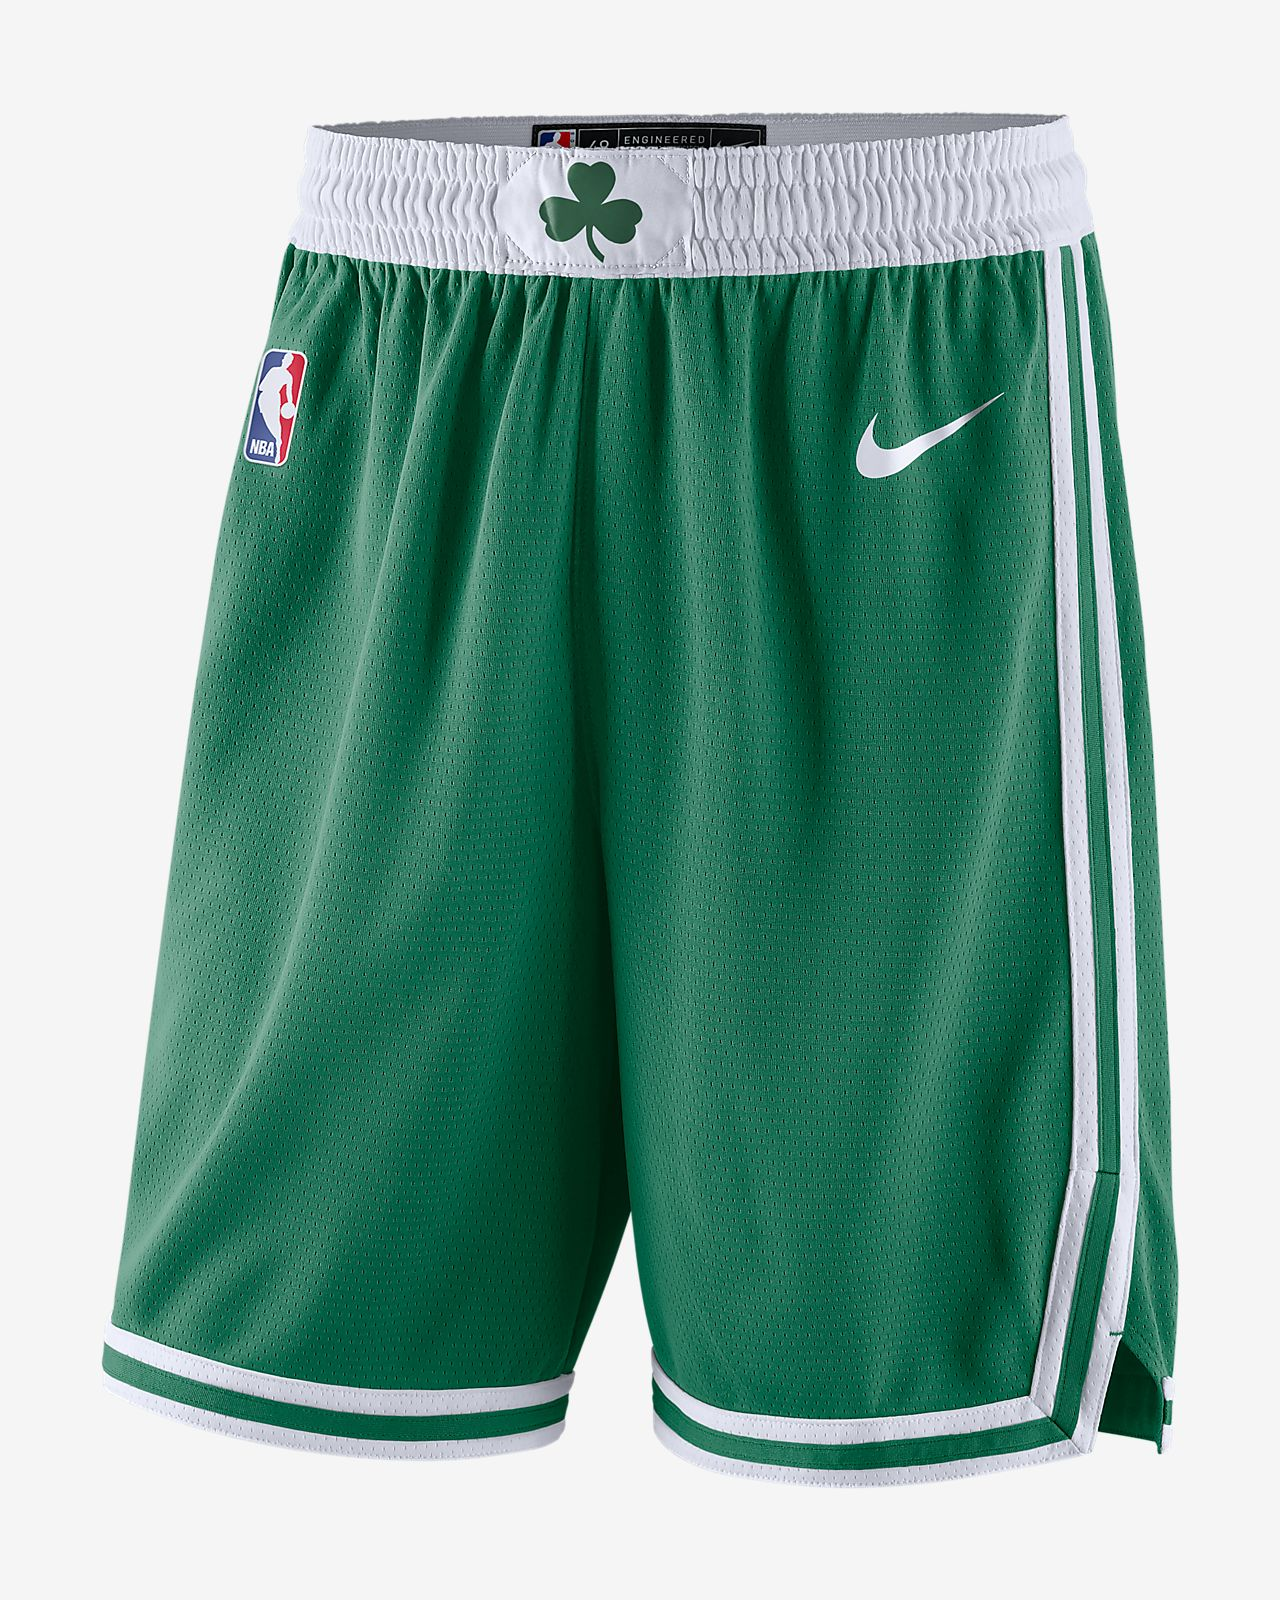 separation shoes 193ae e0ec4 Boston Celtics Icon Edition Swingman Men's Nike NBA Shorts